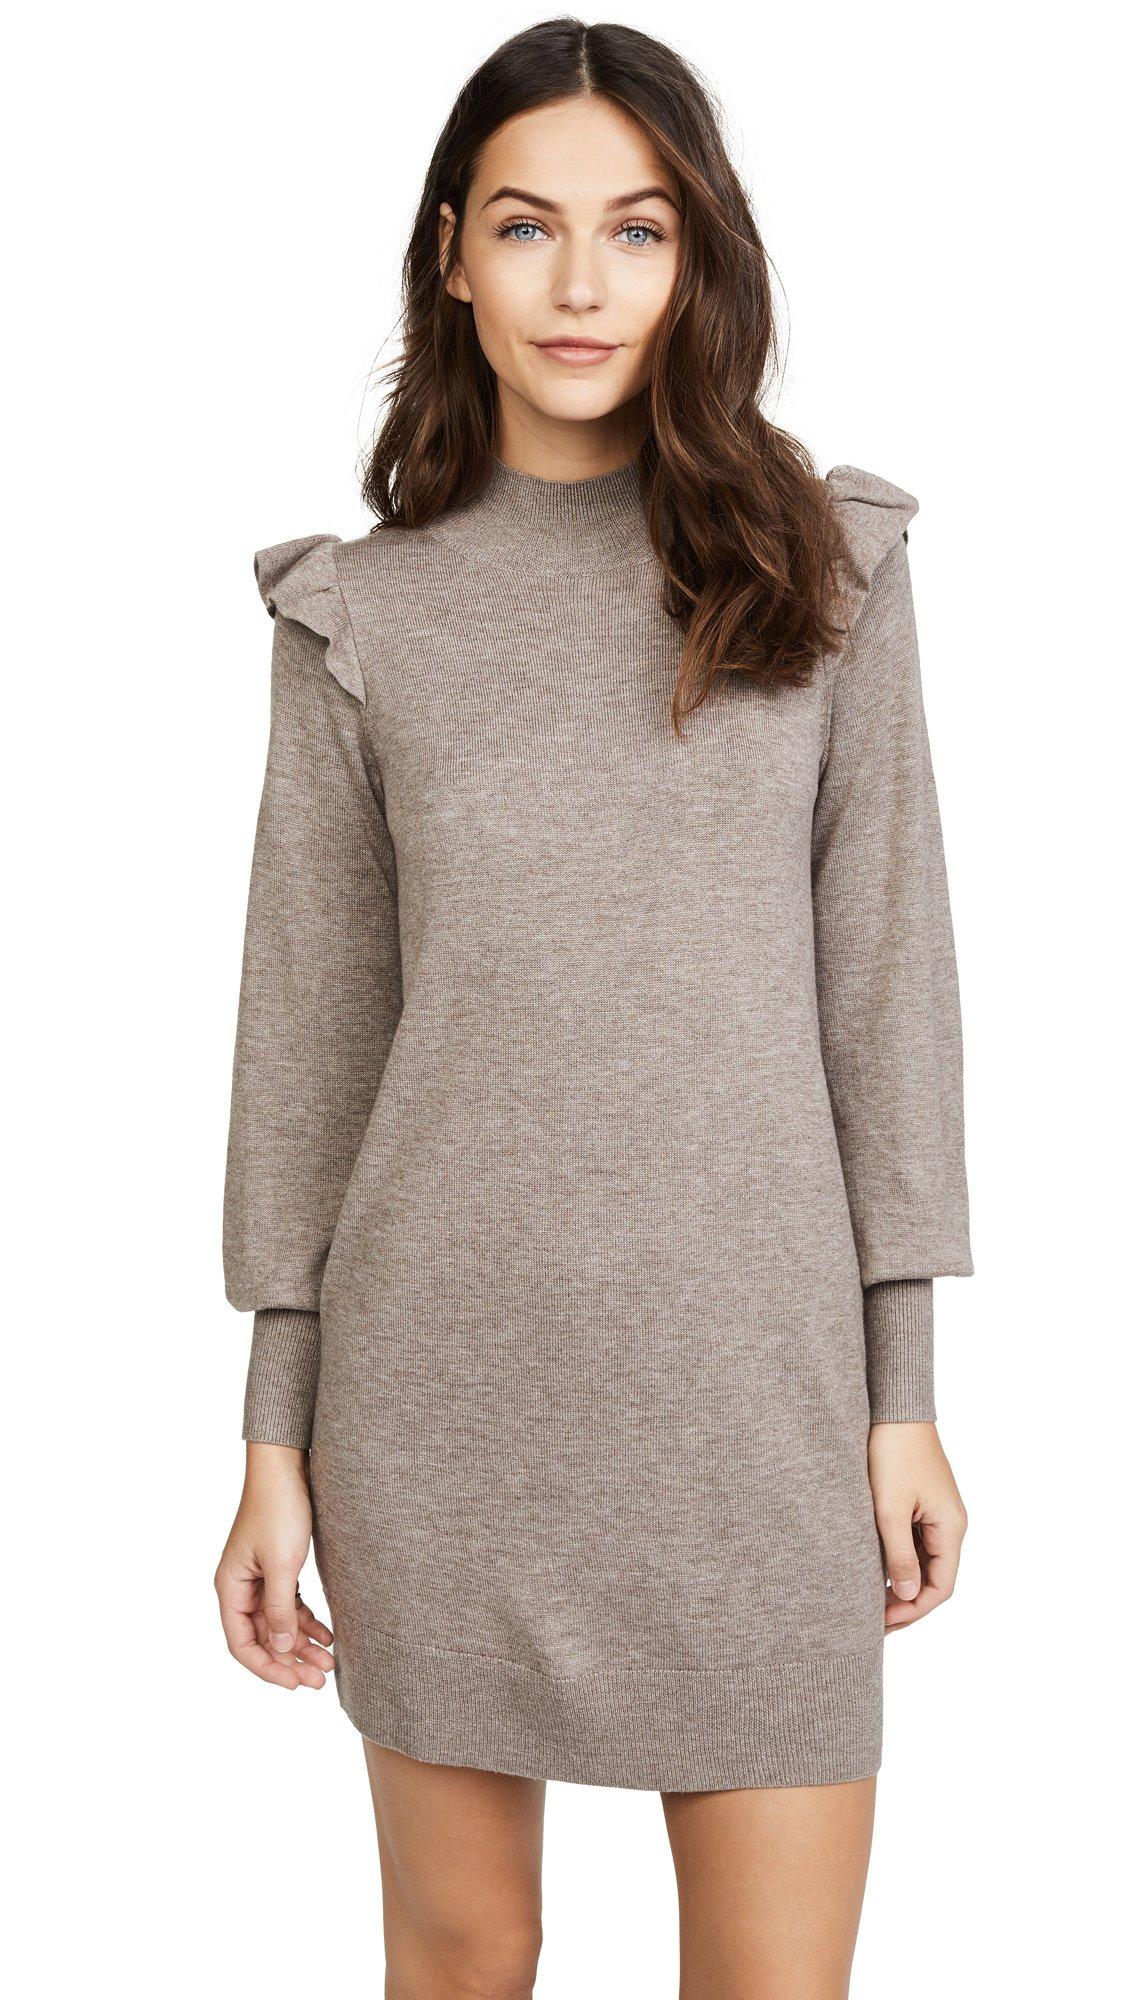 Joie Women's Catriona Dress, Heather Mushroom, X-Small